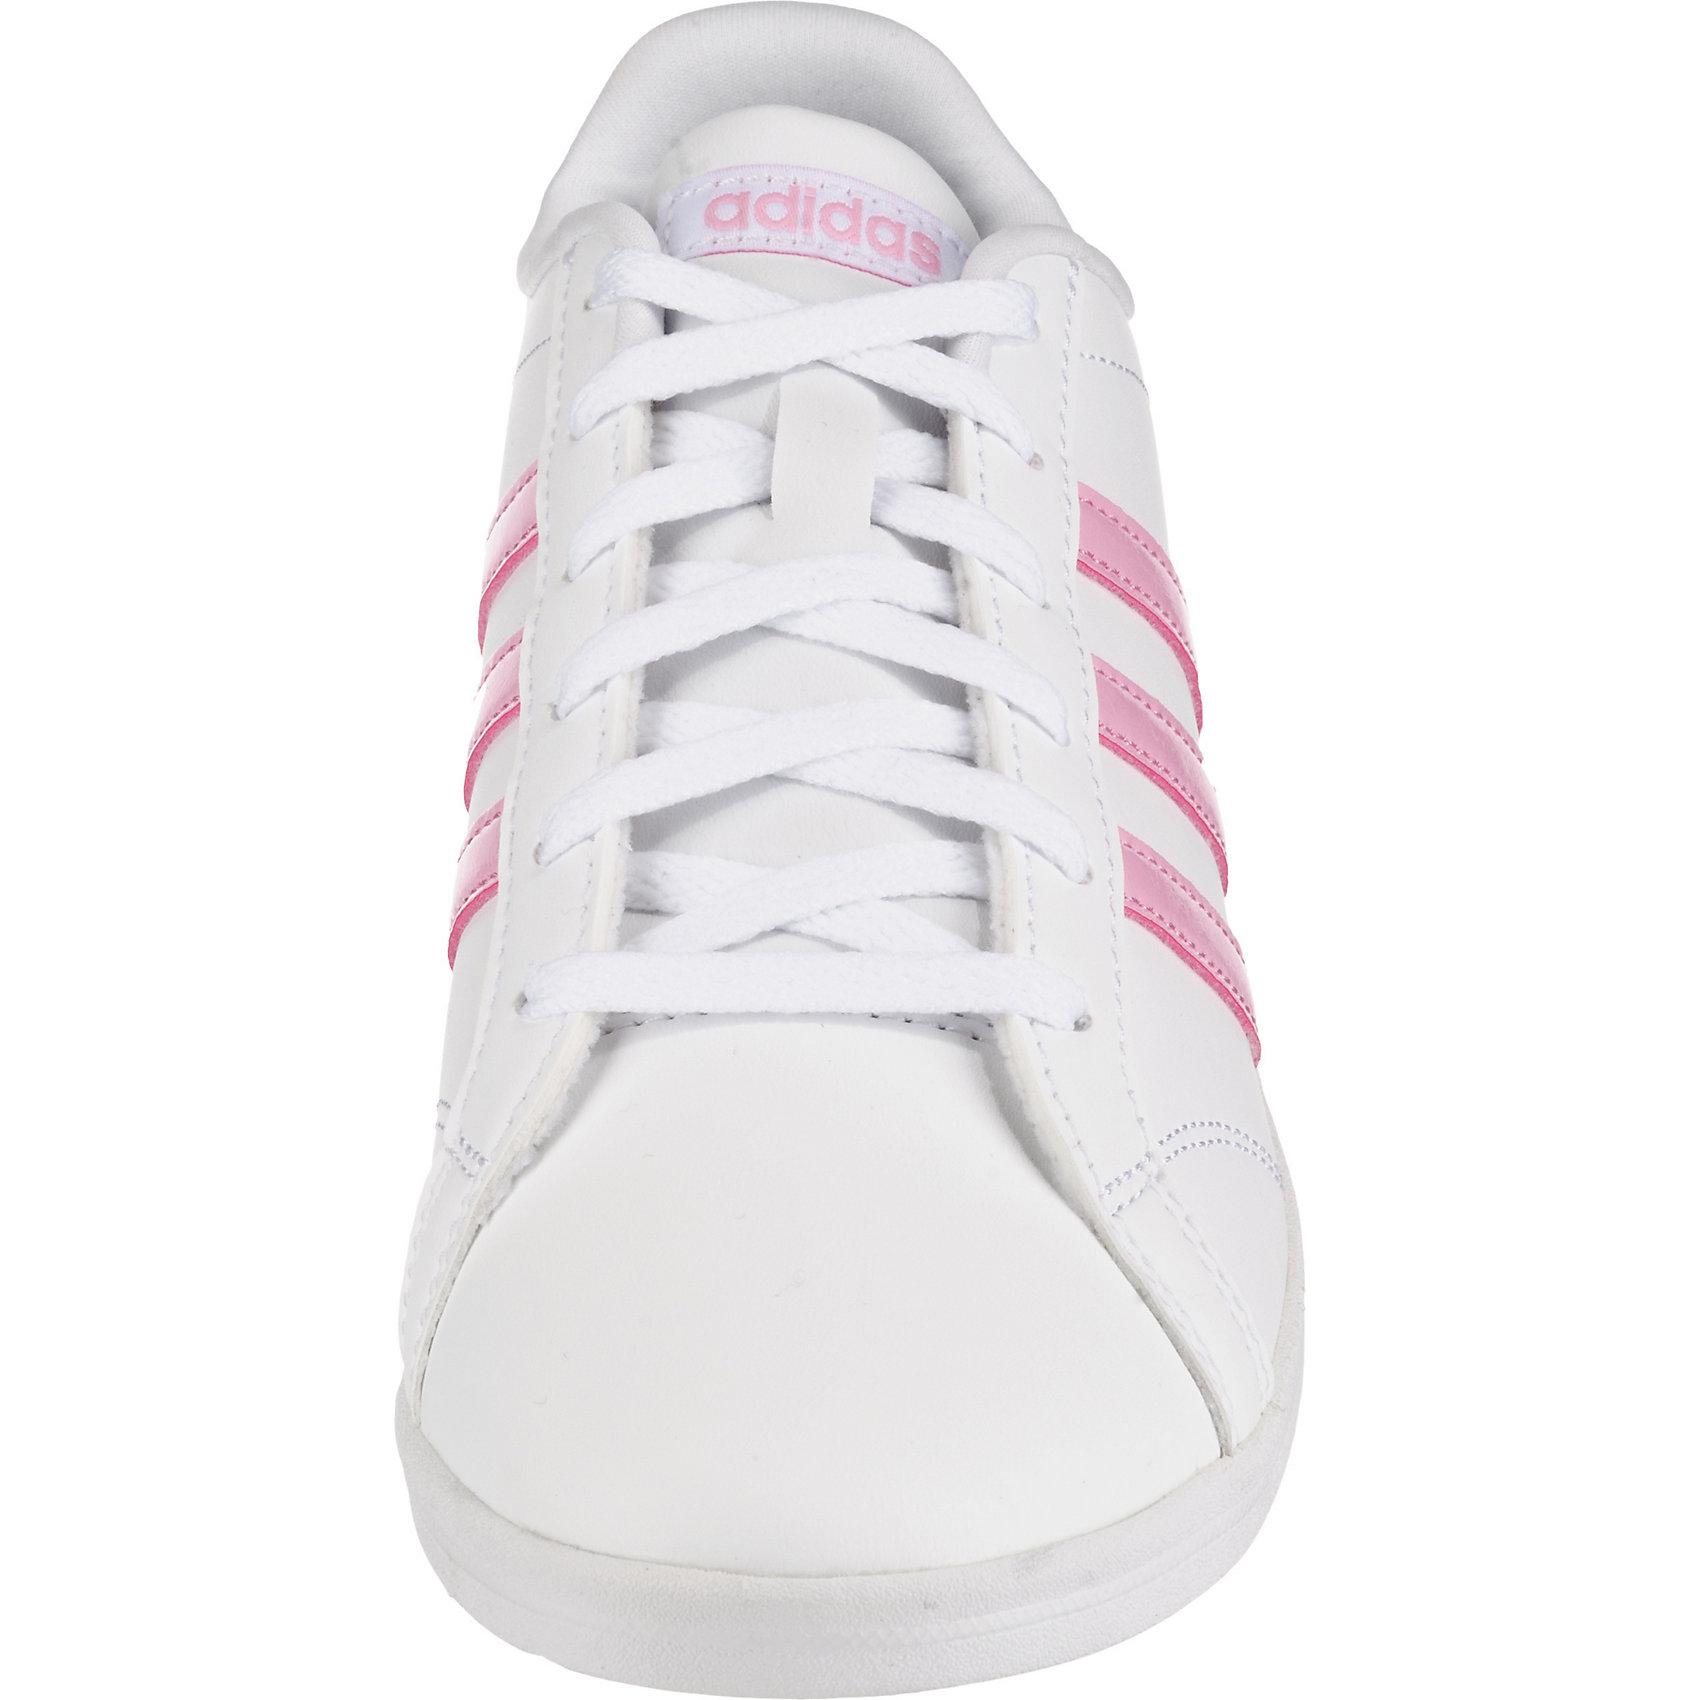 Neu adidas adidas adidas Sport Inspirot Coneo Qt Turnschuhe Low 10413723 für Damen  | New Products  c179c7